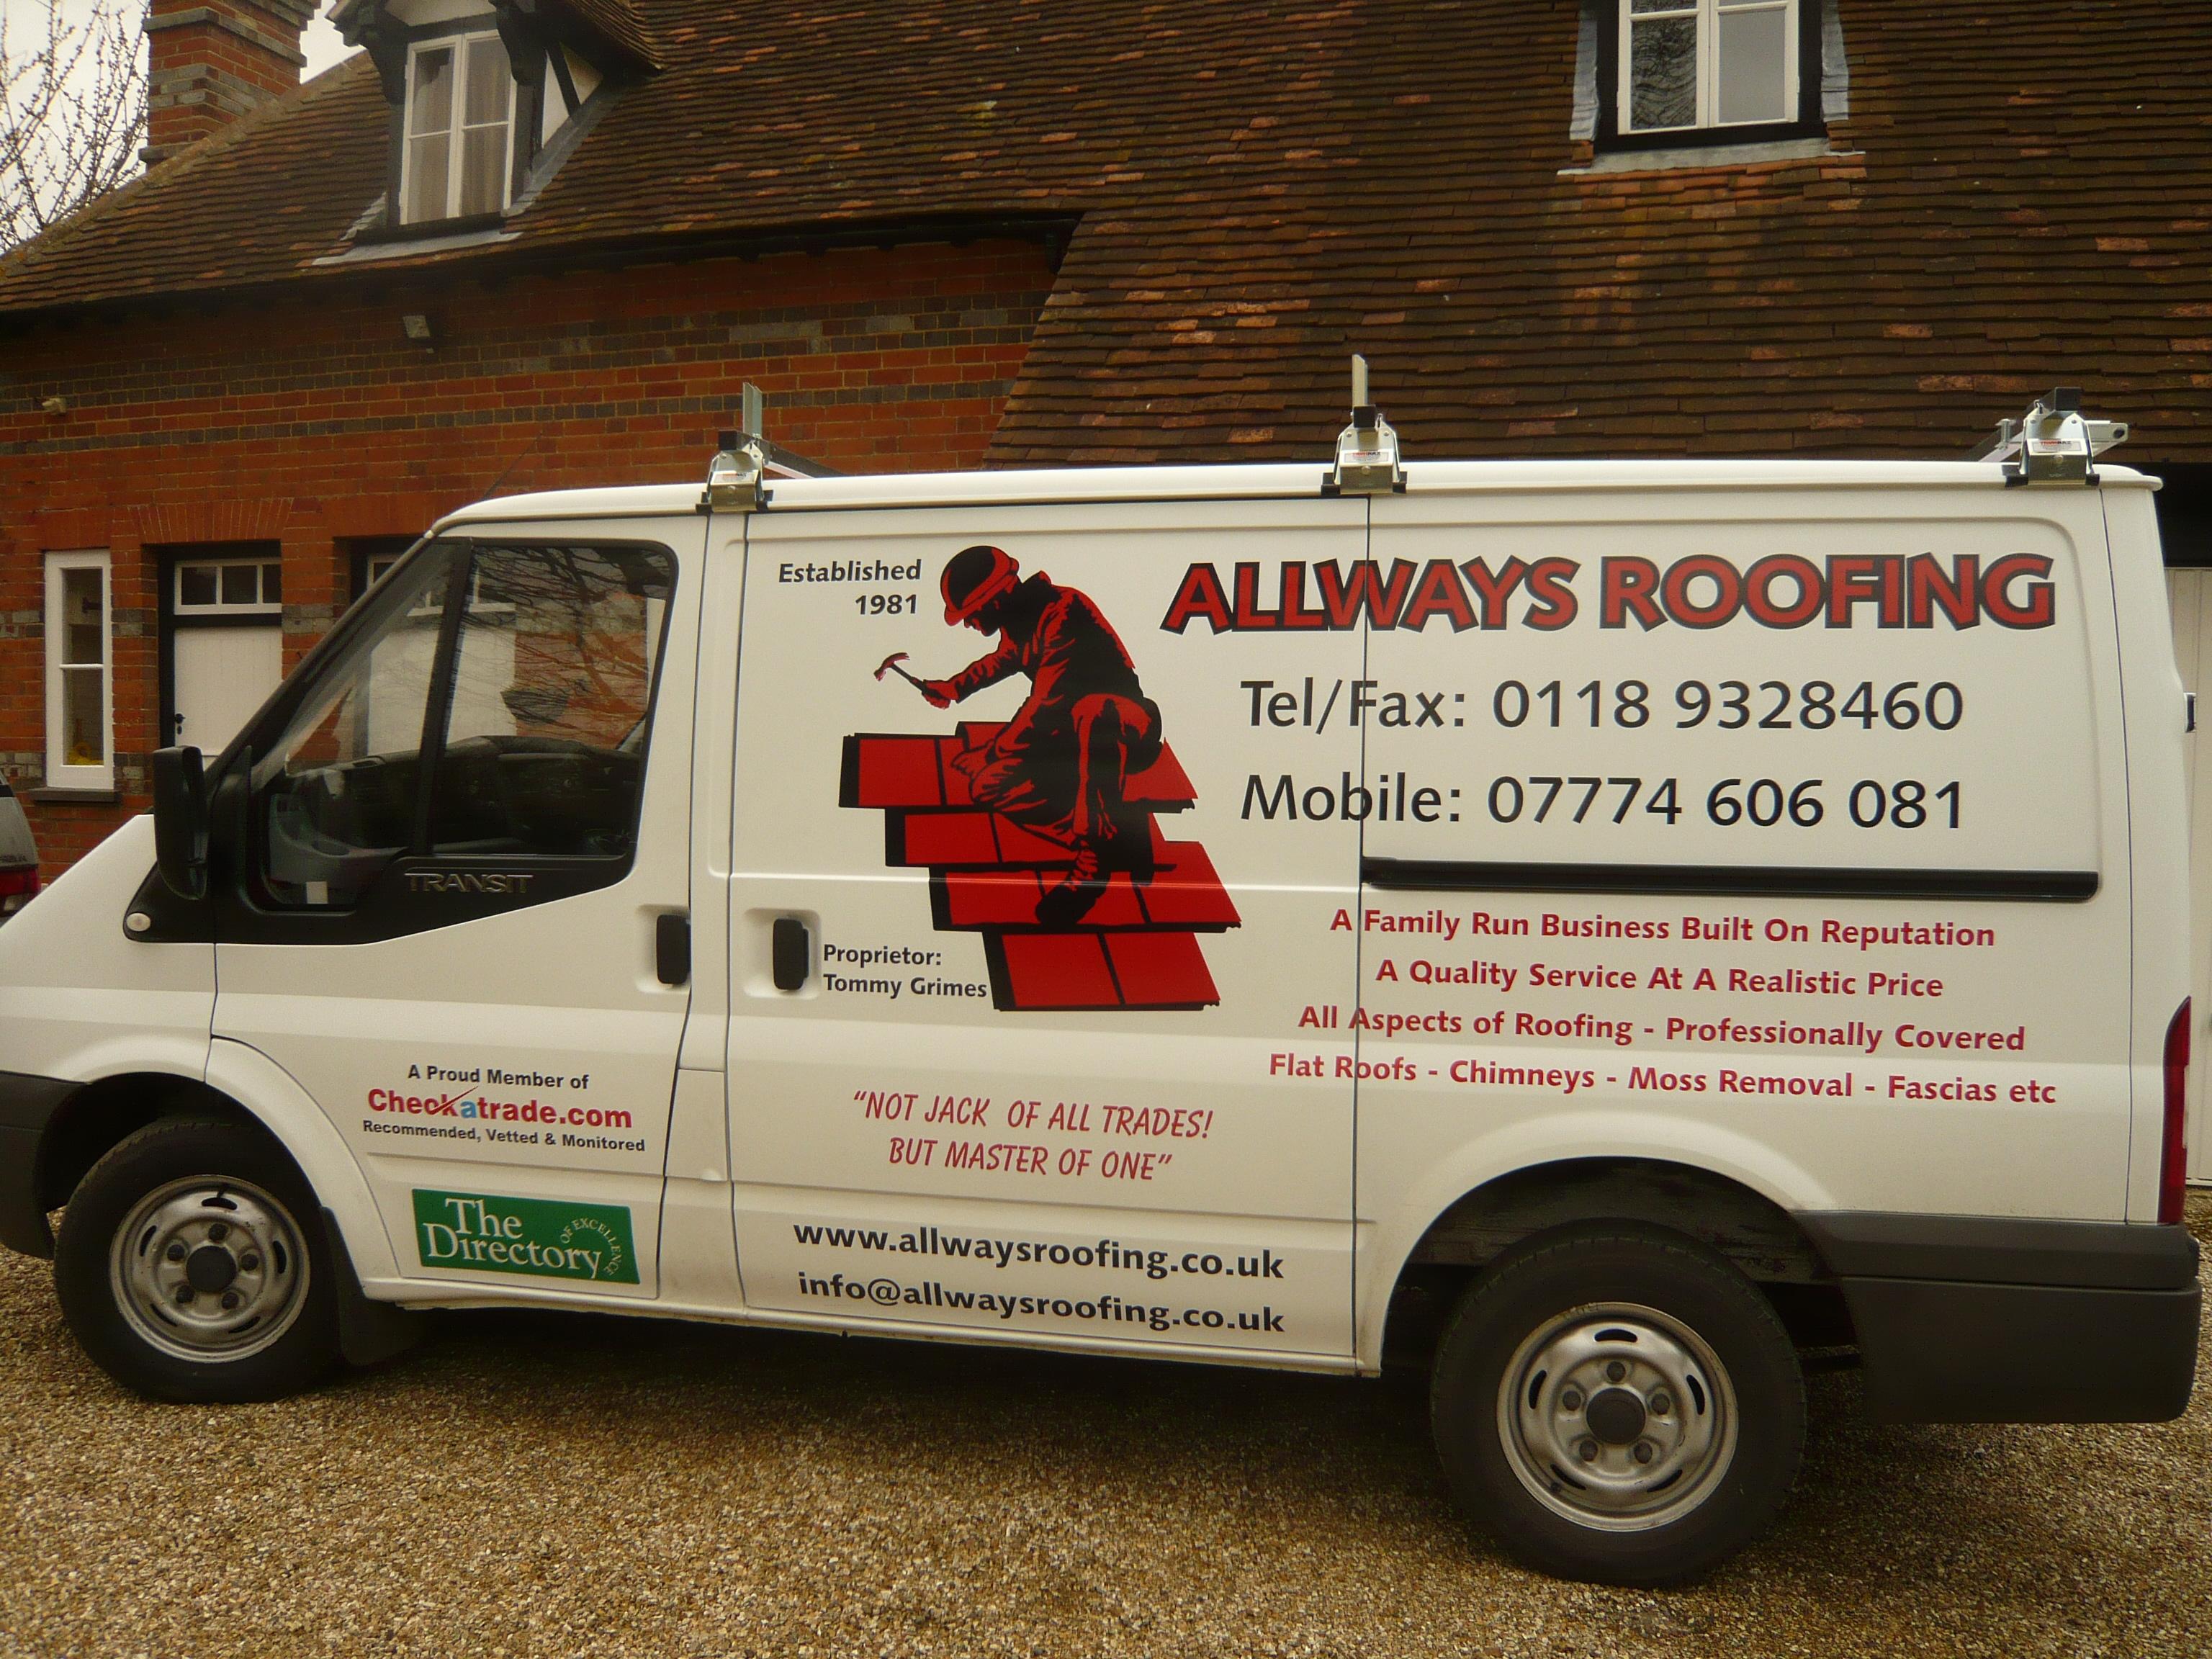 Lovely Allways Roofing Team Latest Van